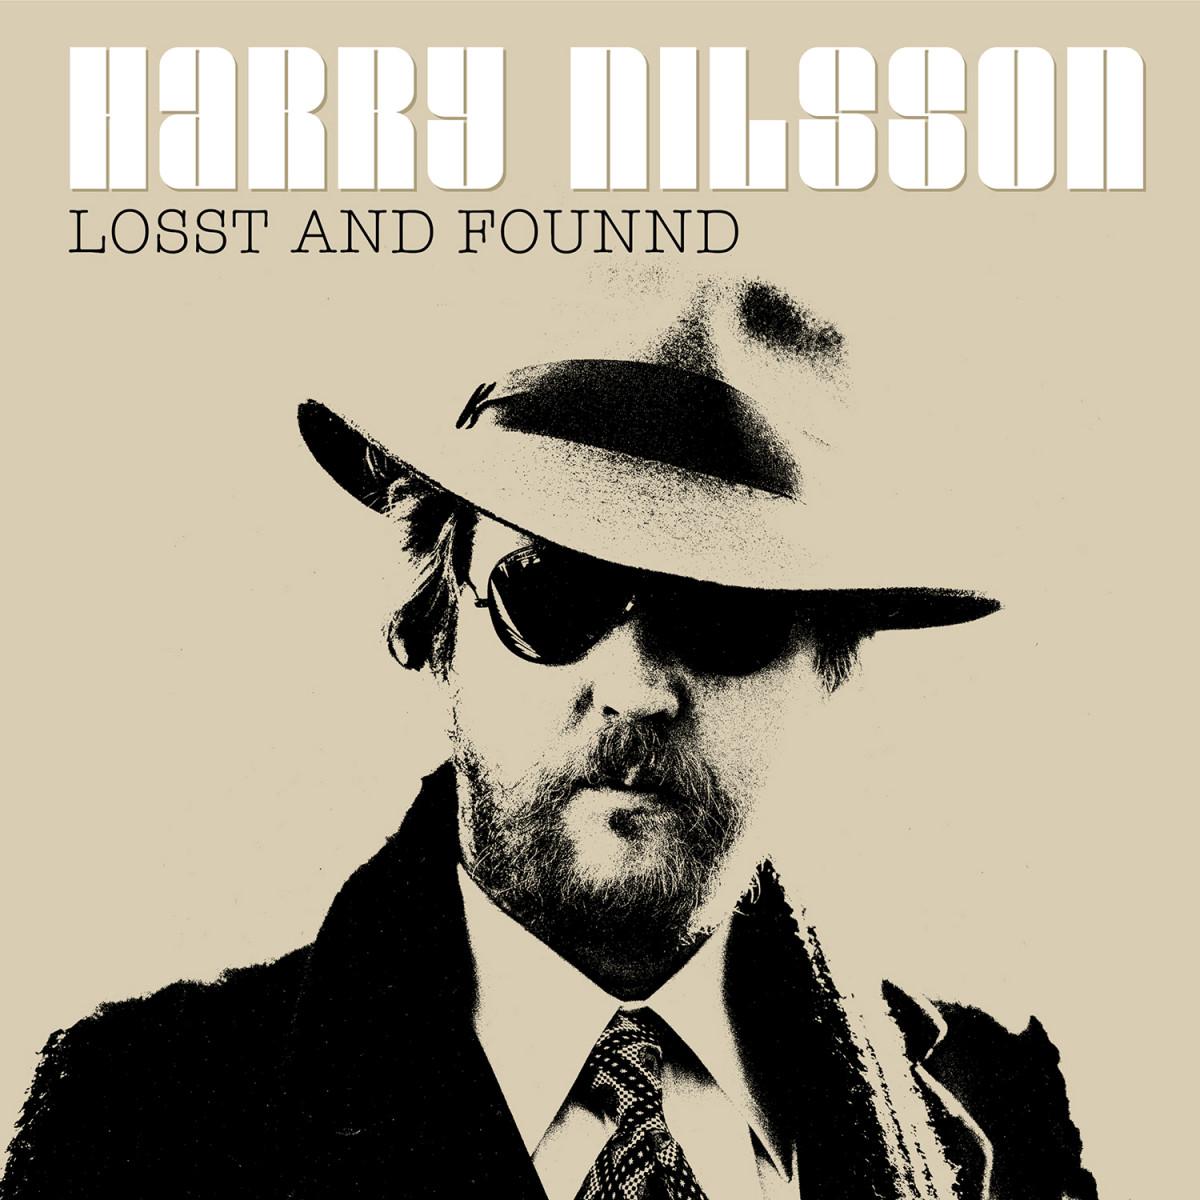 Nilsson-Losst-And-Founnd-OV-346